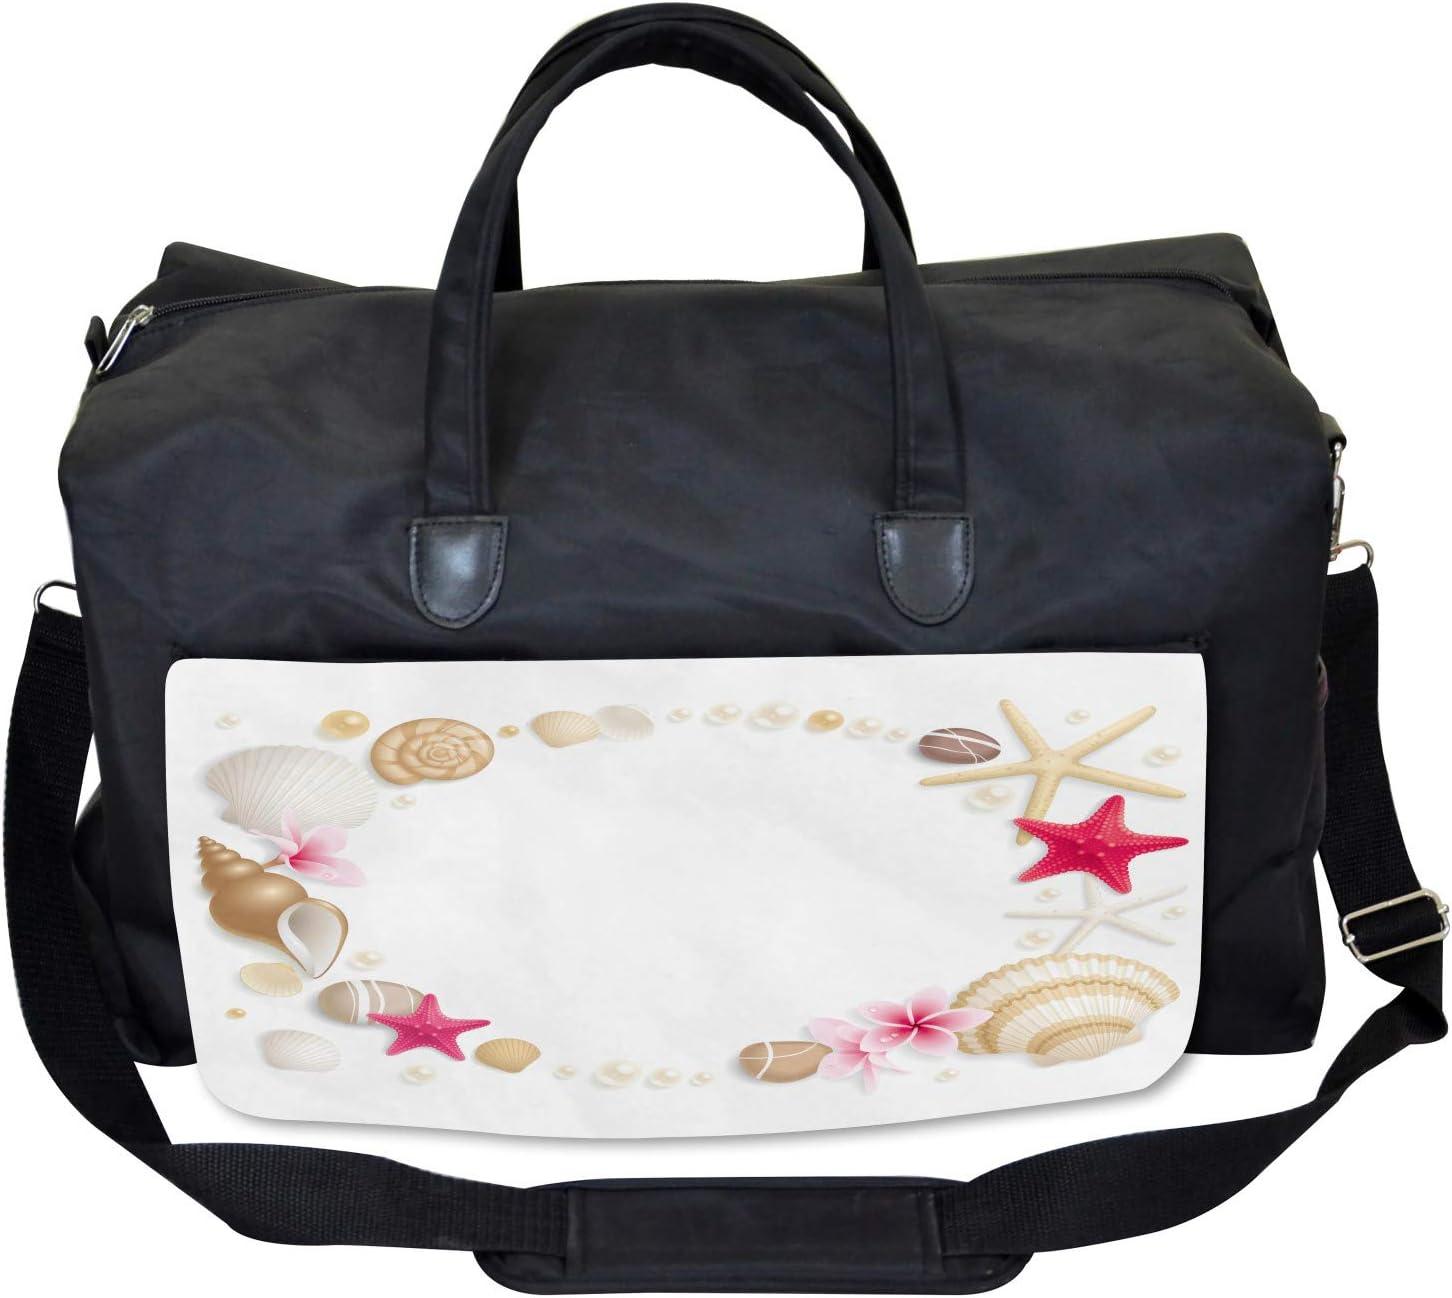 Seashells Flower Star Ambesonne Exotic Gym Bag Large Weekender Carry-on